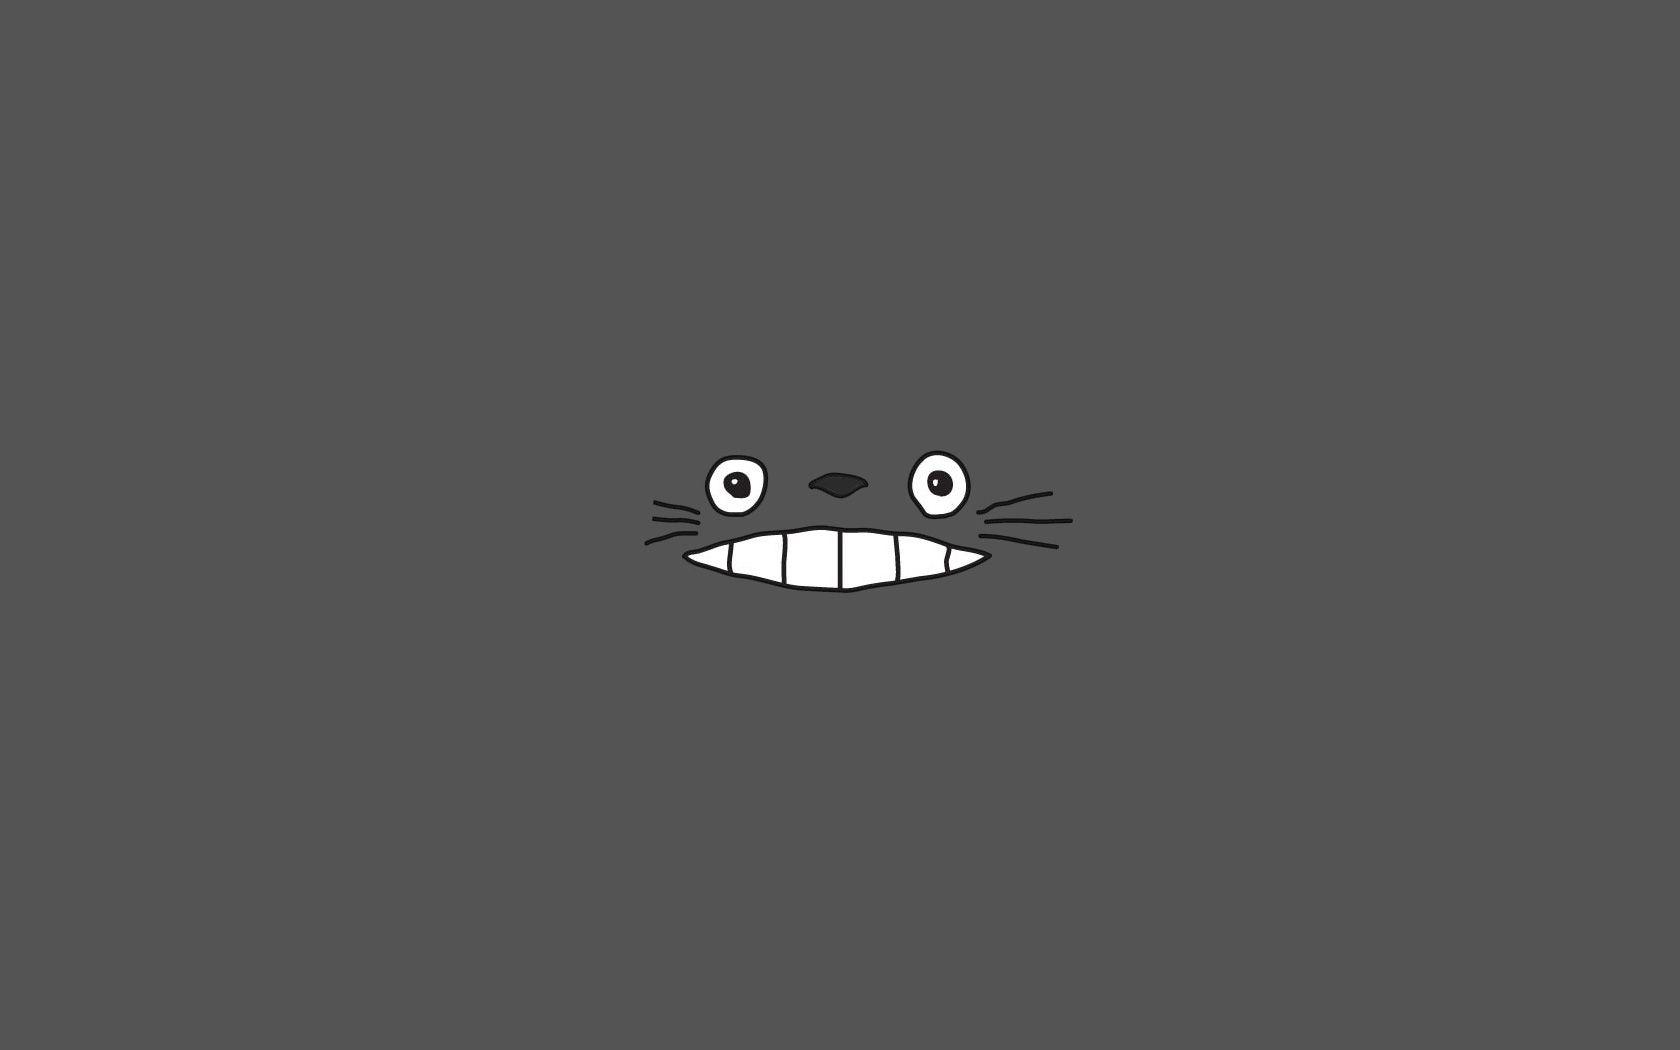 My Neighbour Totoro Studio Ghibli Simple Background 1680x1050 Wallpaper 배경화면 아이폰 디즈니 배경화면 노트북 배경화면